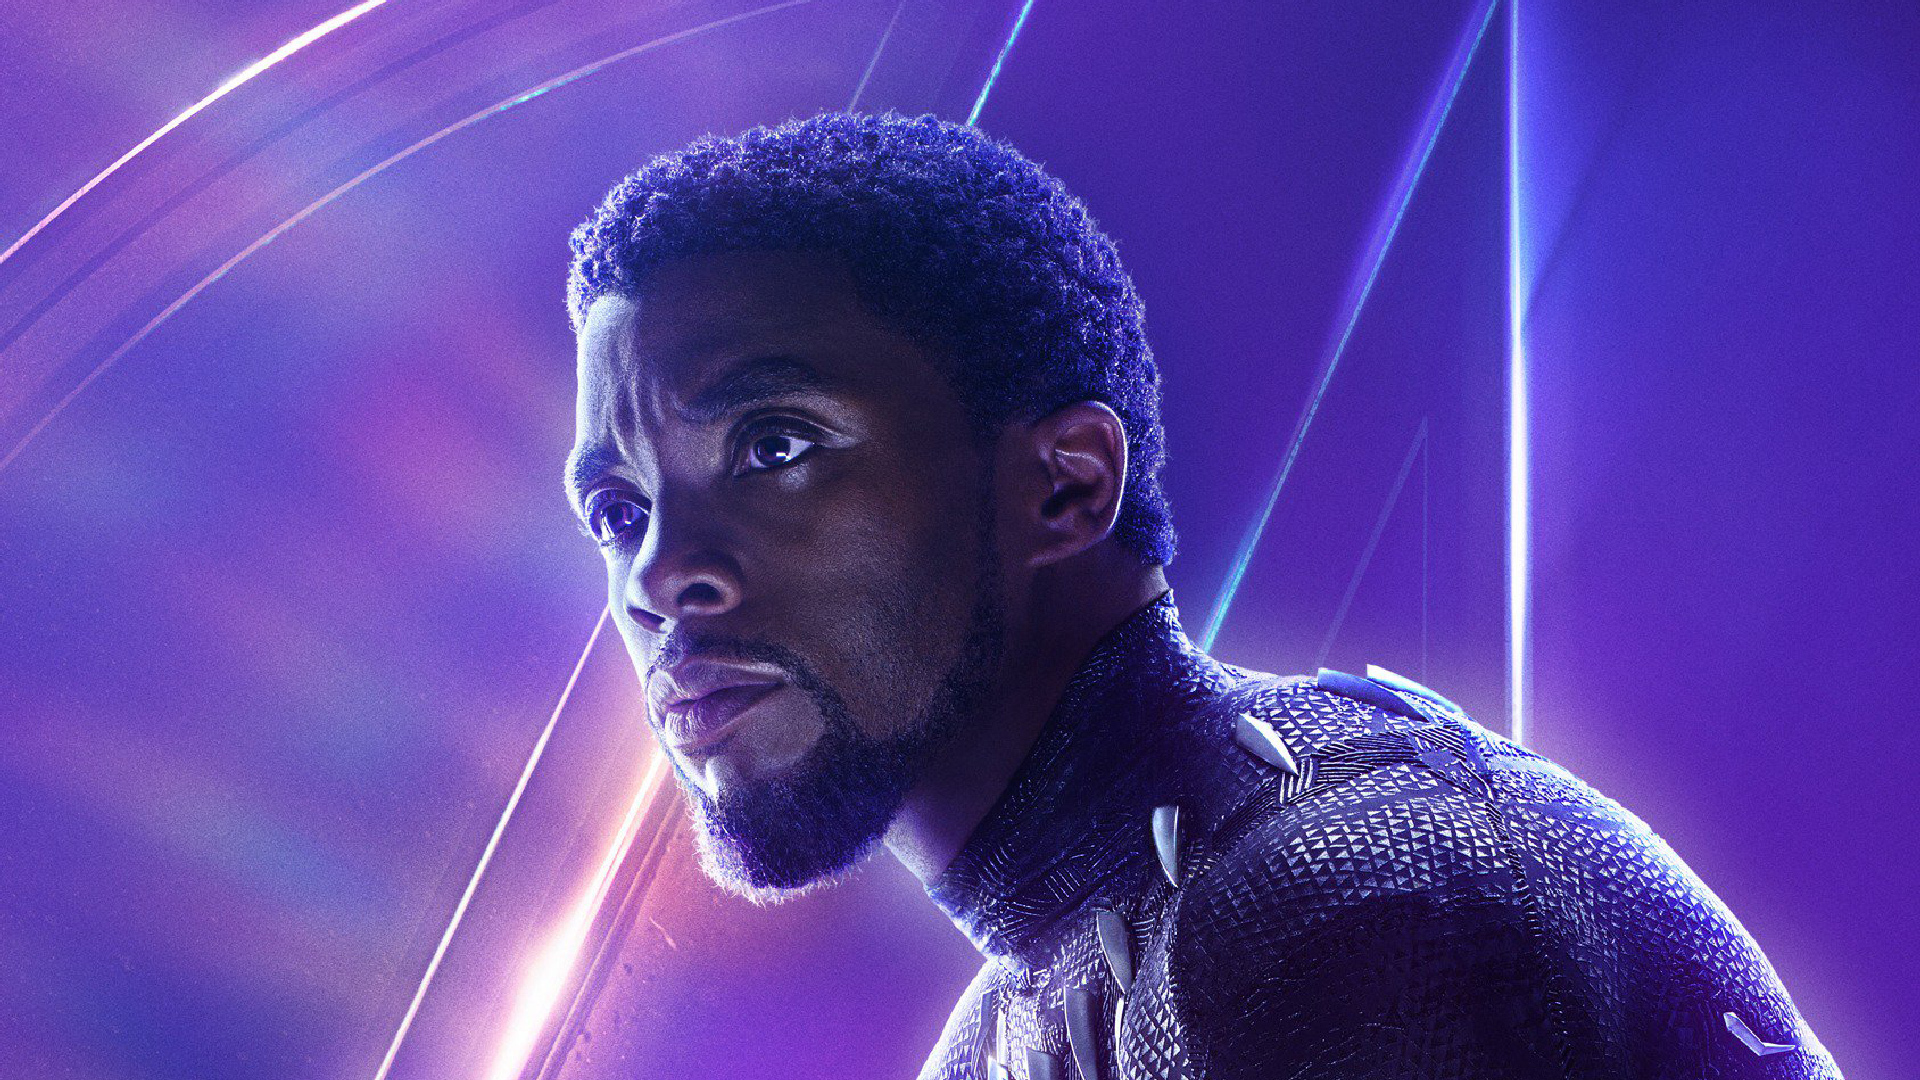 Shuri In Avengers Infinity War New Poster Hd Movies 4k: 1920x1080 Black Panther In Avengers Infinity War New